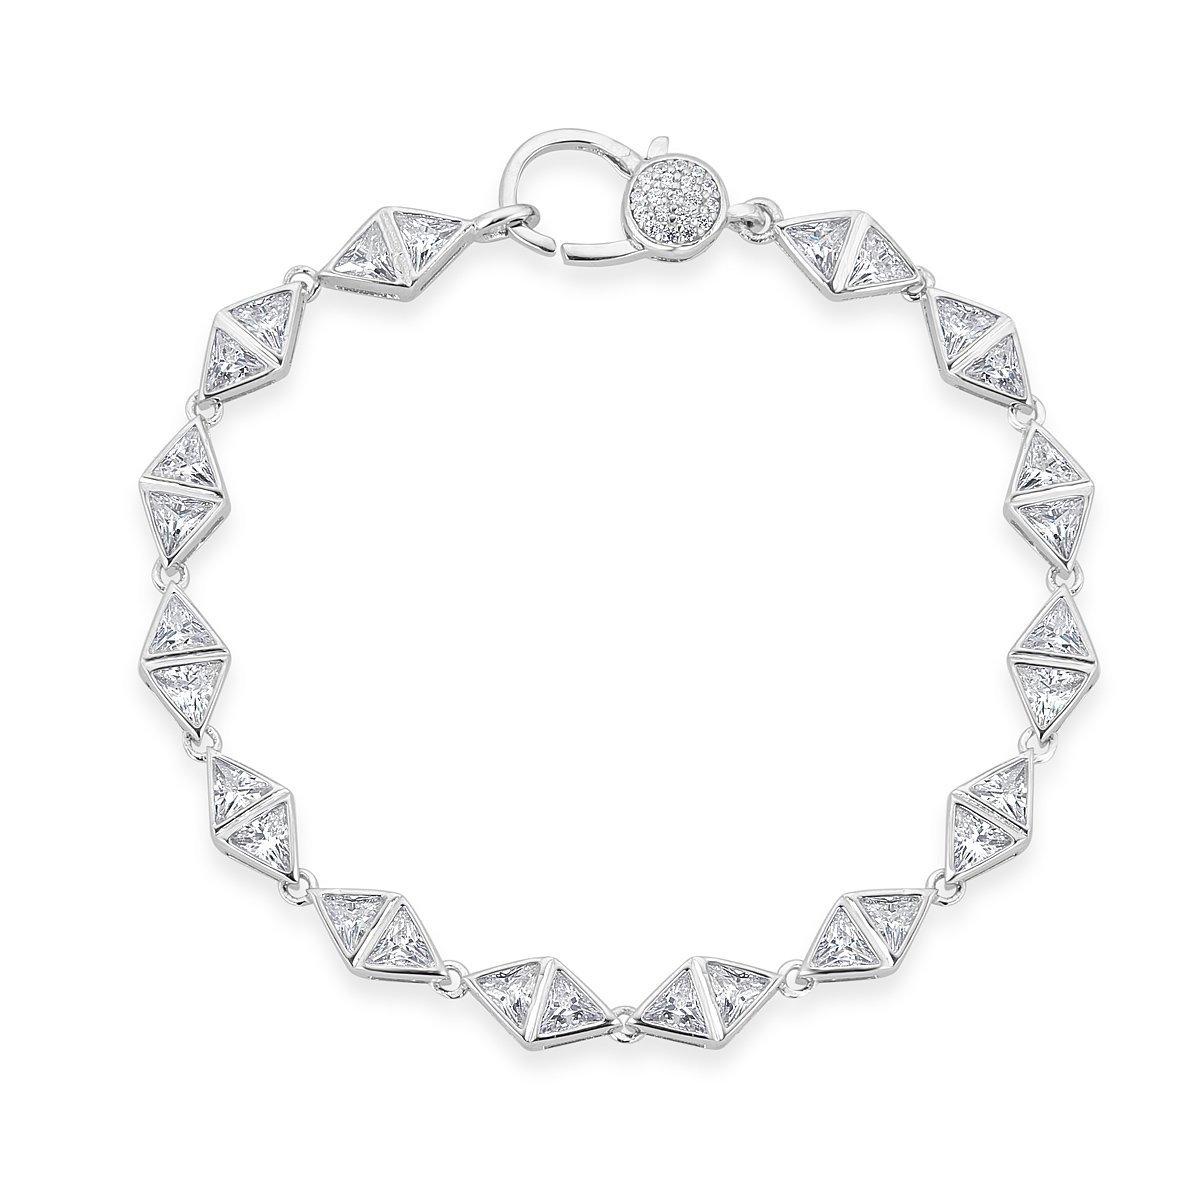 Platinum Plated Sterling Silver Cubic Zirconia Bling Bracelet